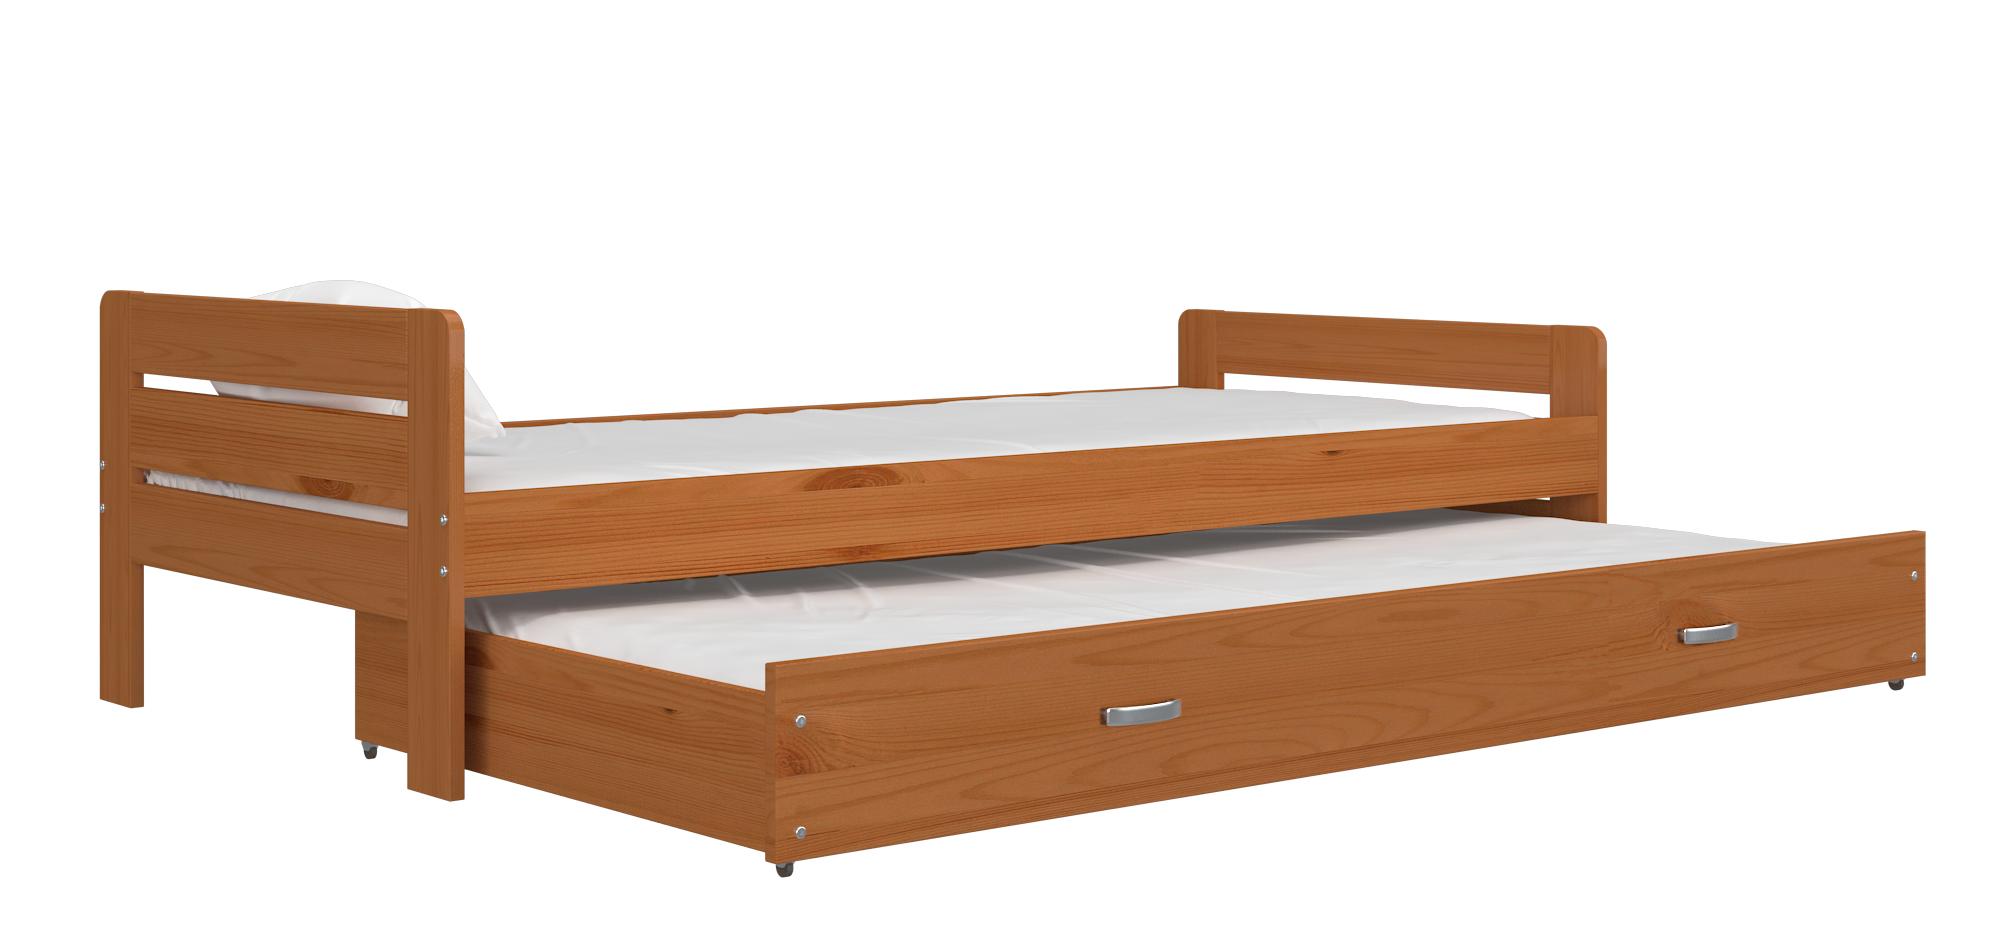 ArtAJ Detská posteľ Ben Farba: Jelša, Typ: bez matraca